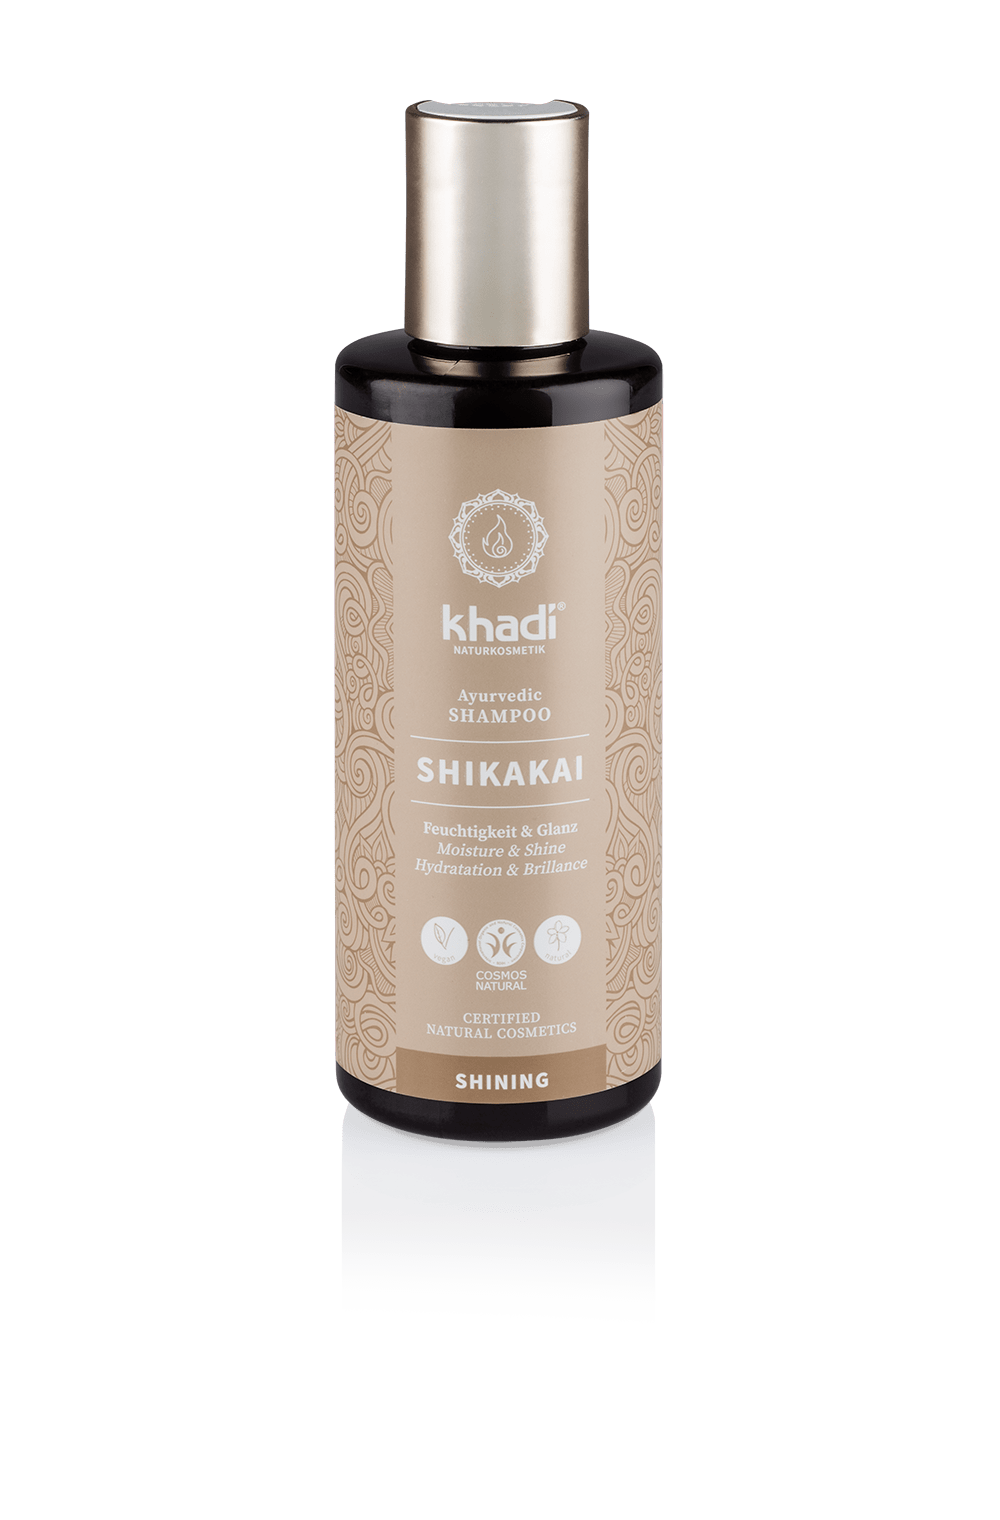 Khadi Shikakai shampoo